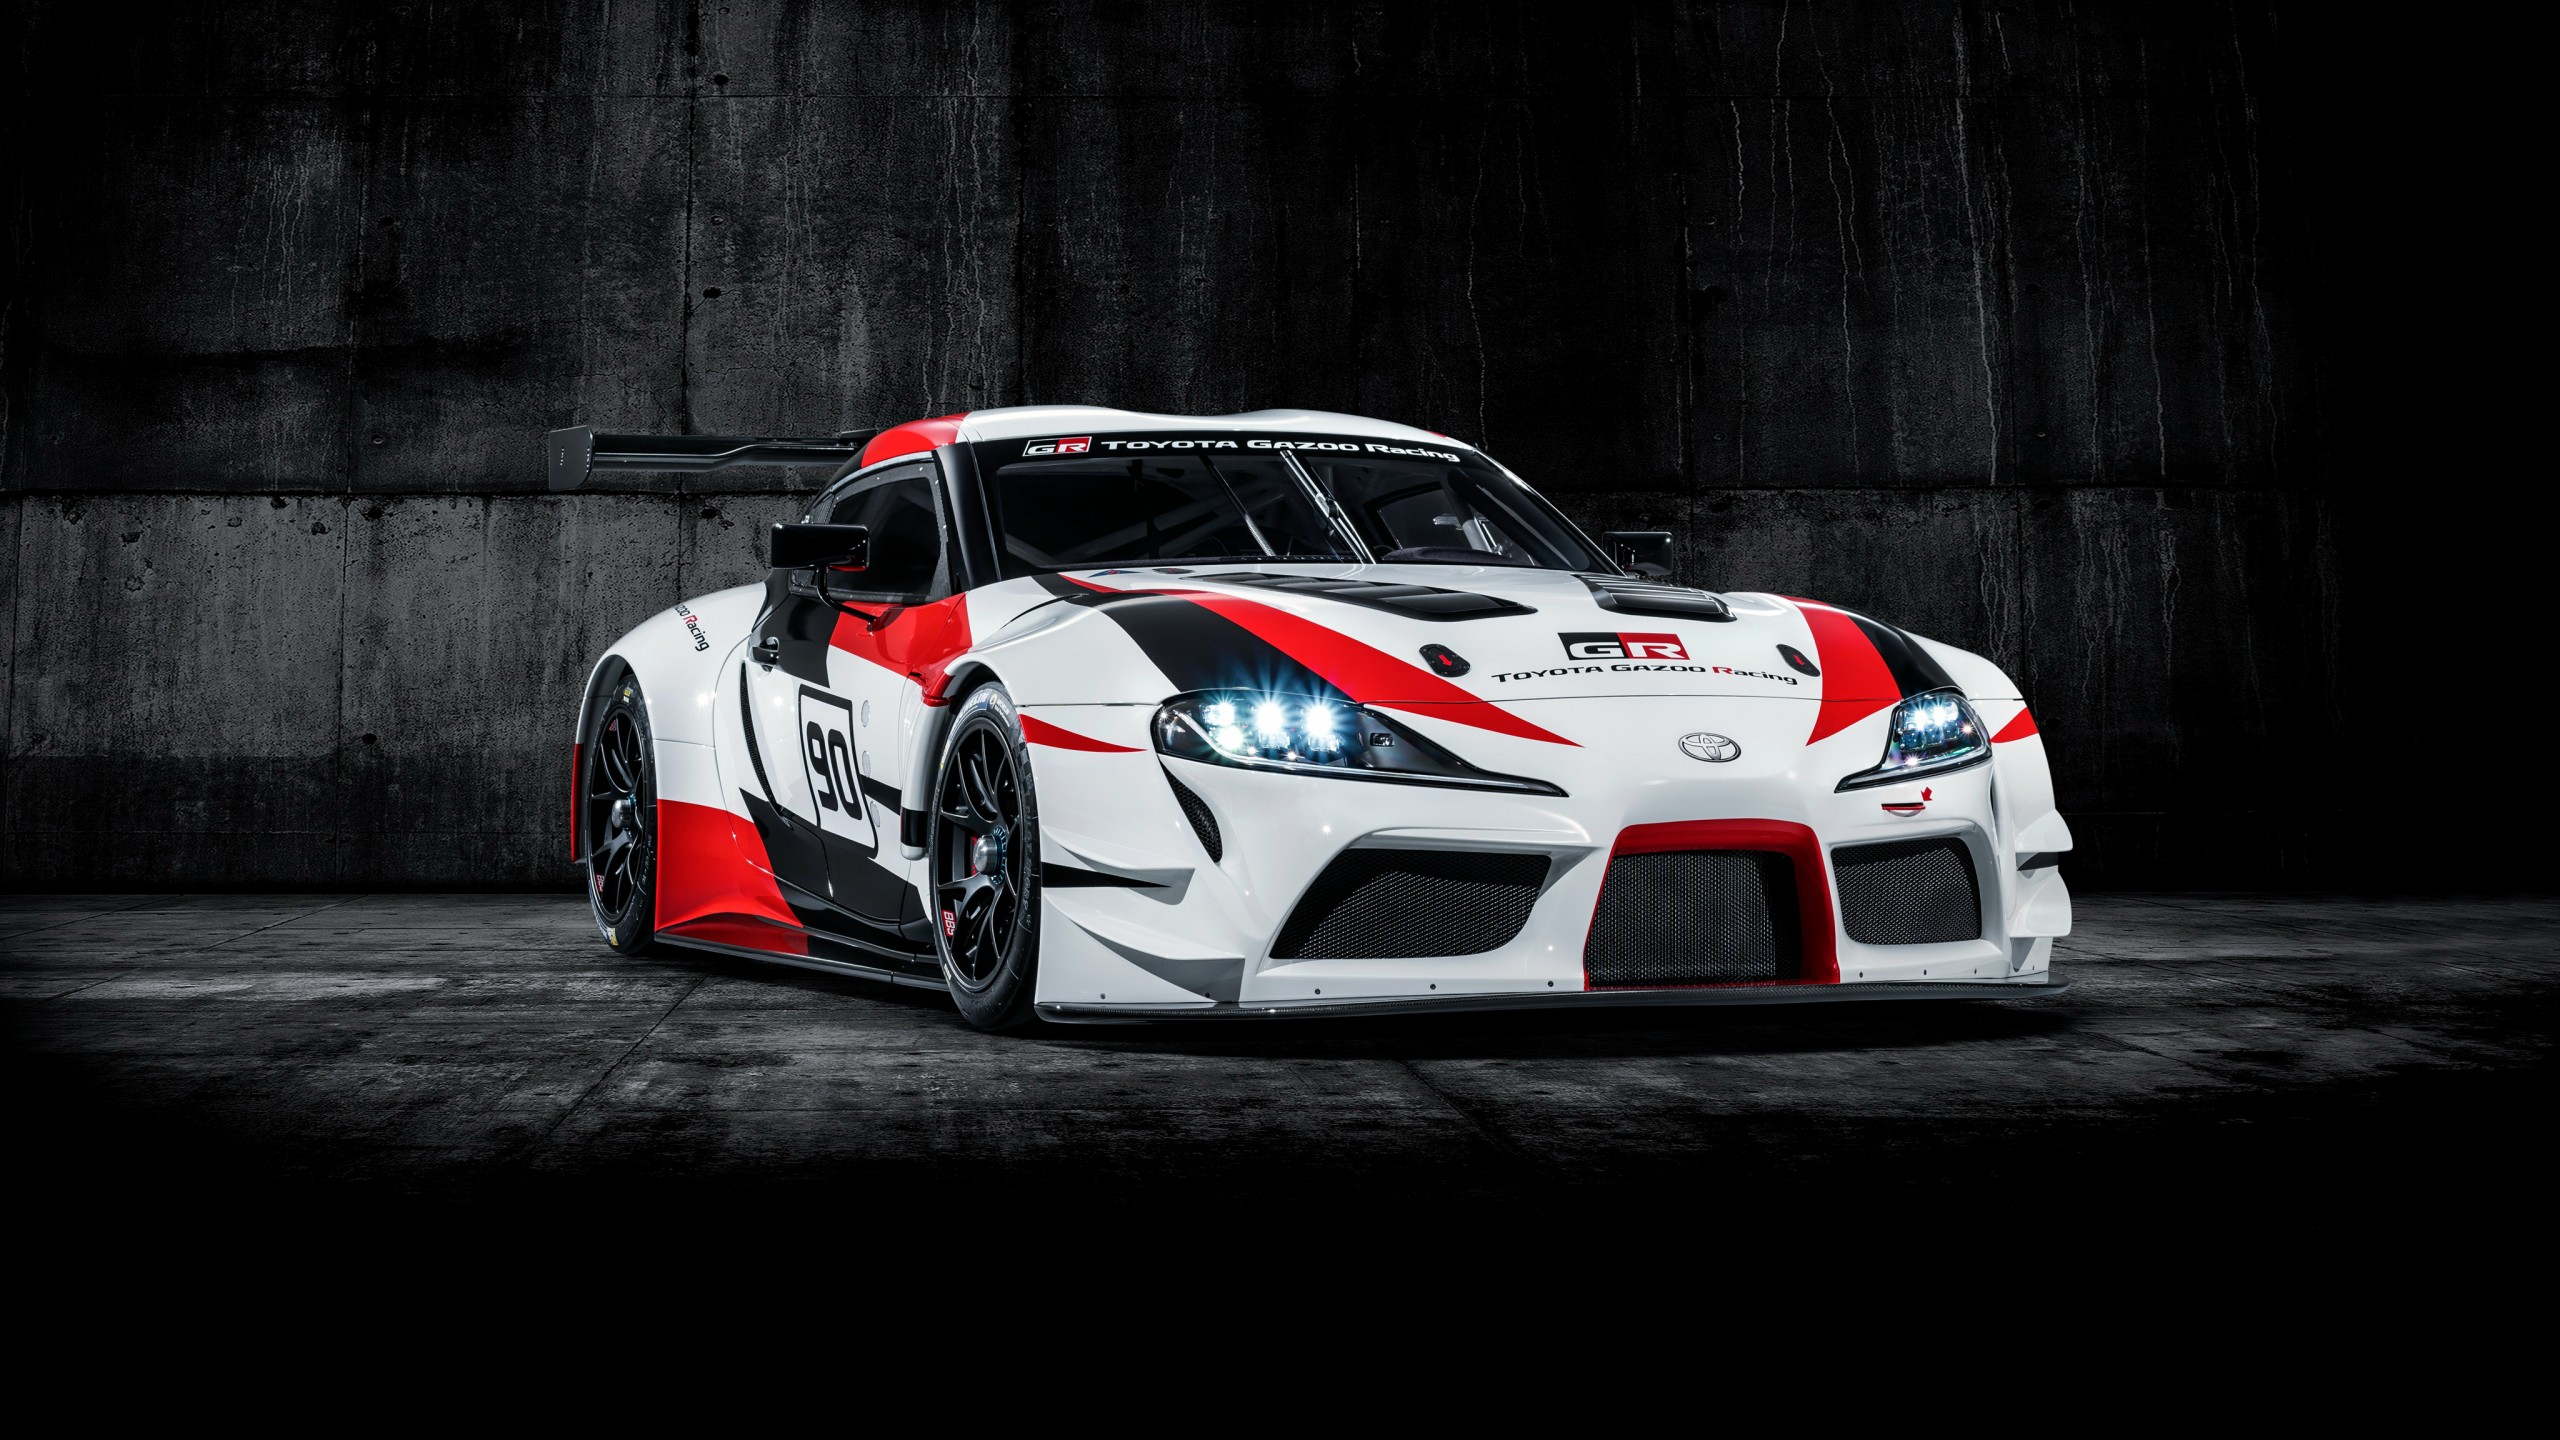 2018 Toyota GR Supra Racing Concept 4K 5 Wallpaper | HD ...